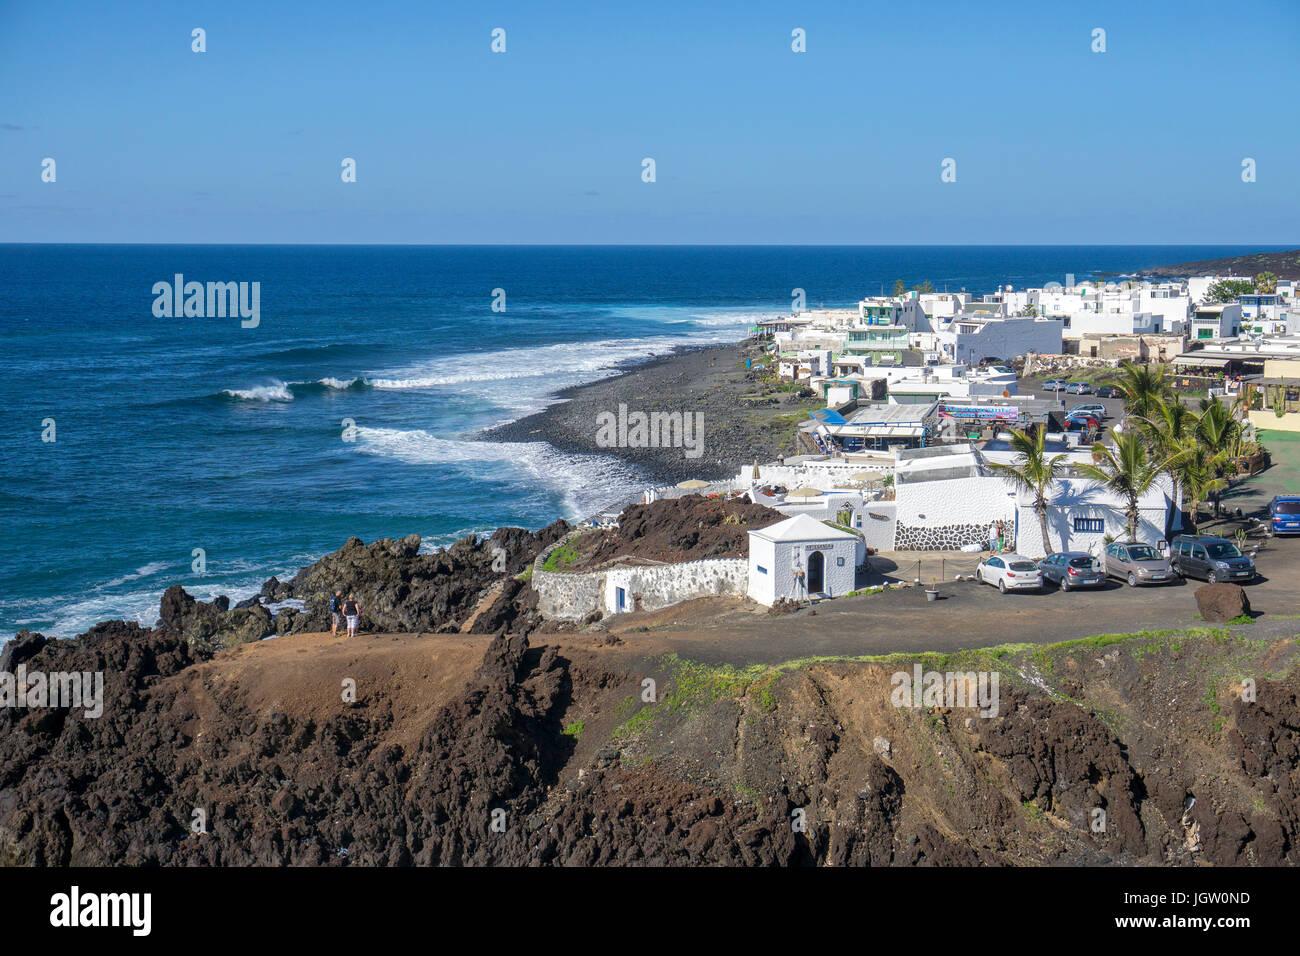 Fishing village El Golfo at west coast of Lanzarote island, Canary islands, Spain, Europe Stock Photo